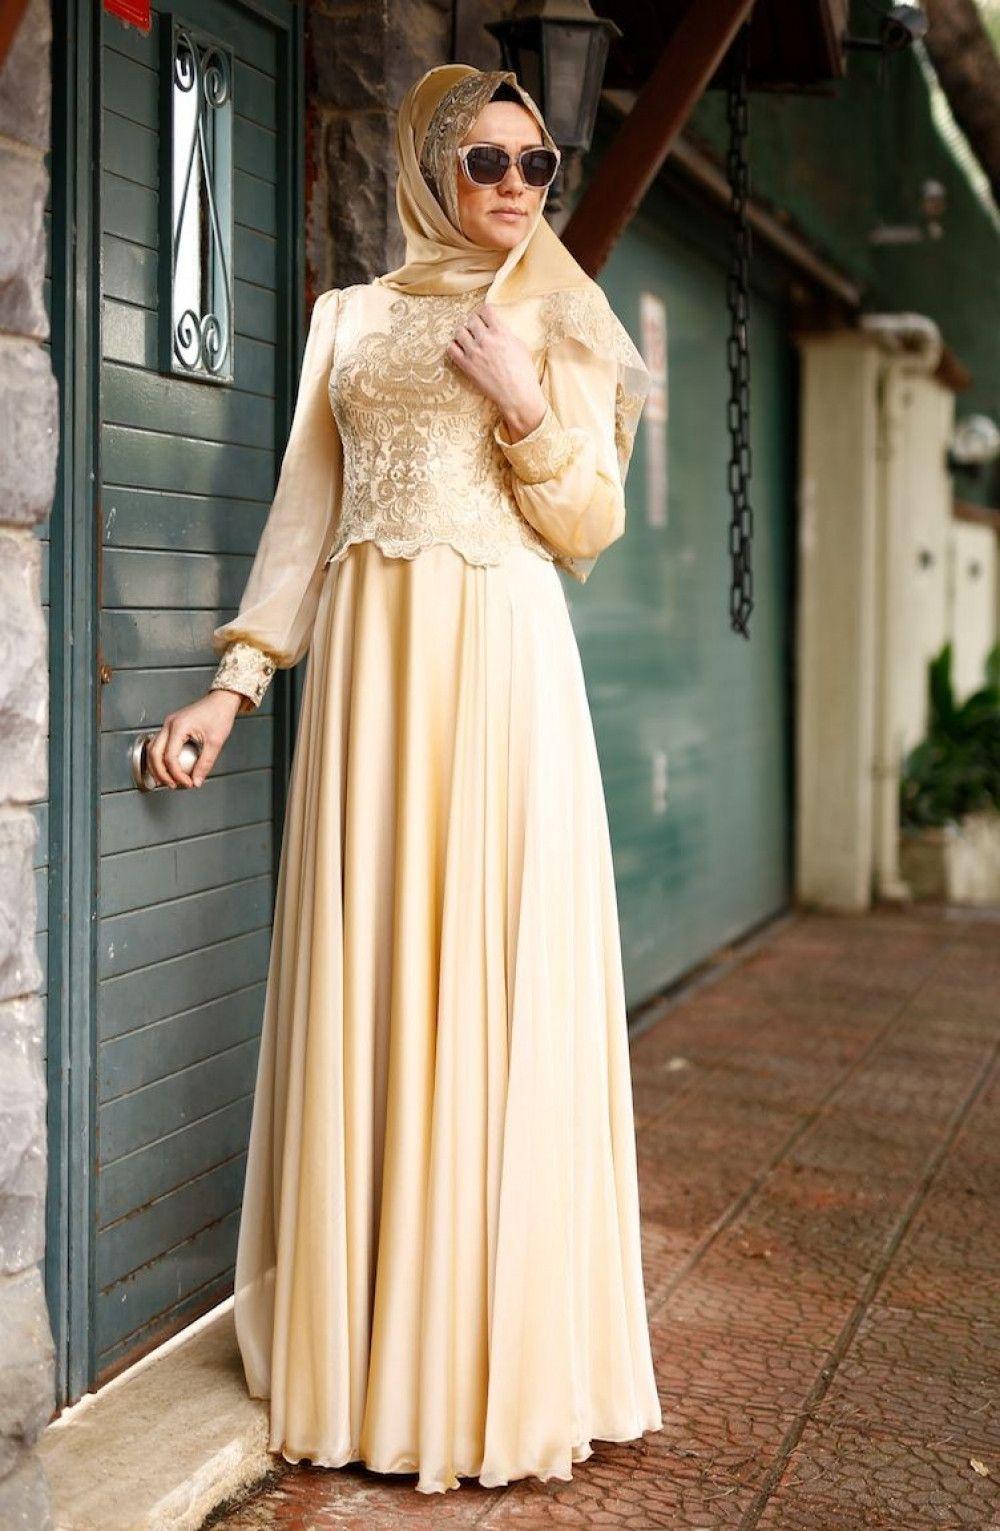 Sefamerve Tesettur Gold Dantelli Abiye Elbise Modelleri Moda Tesettur Giyim Elbise Modelleri Elbise Maksi Elbiseler